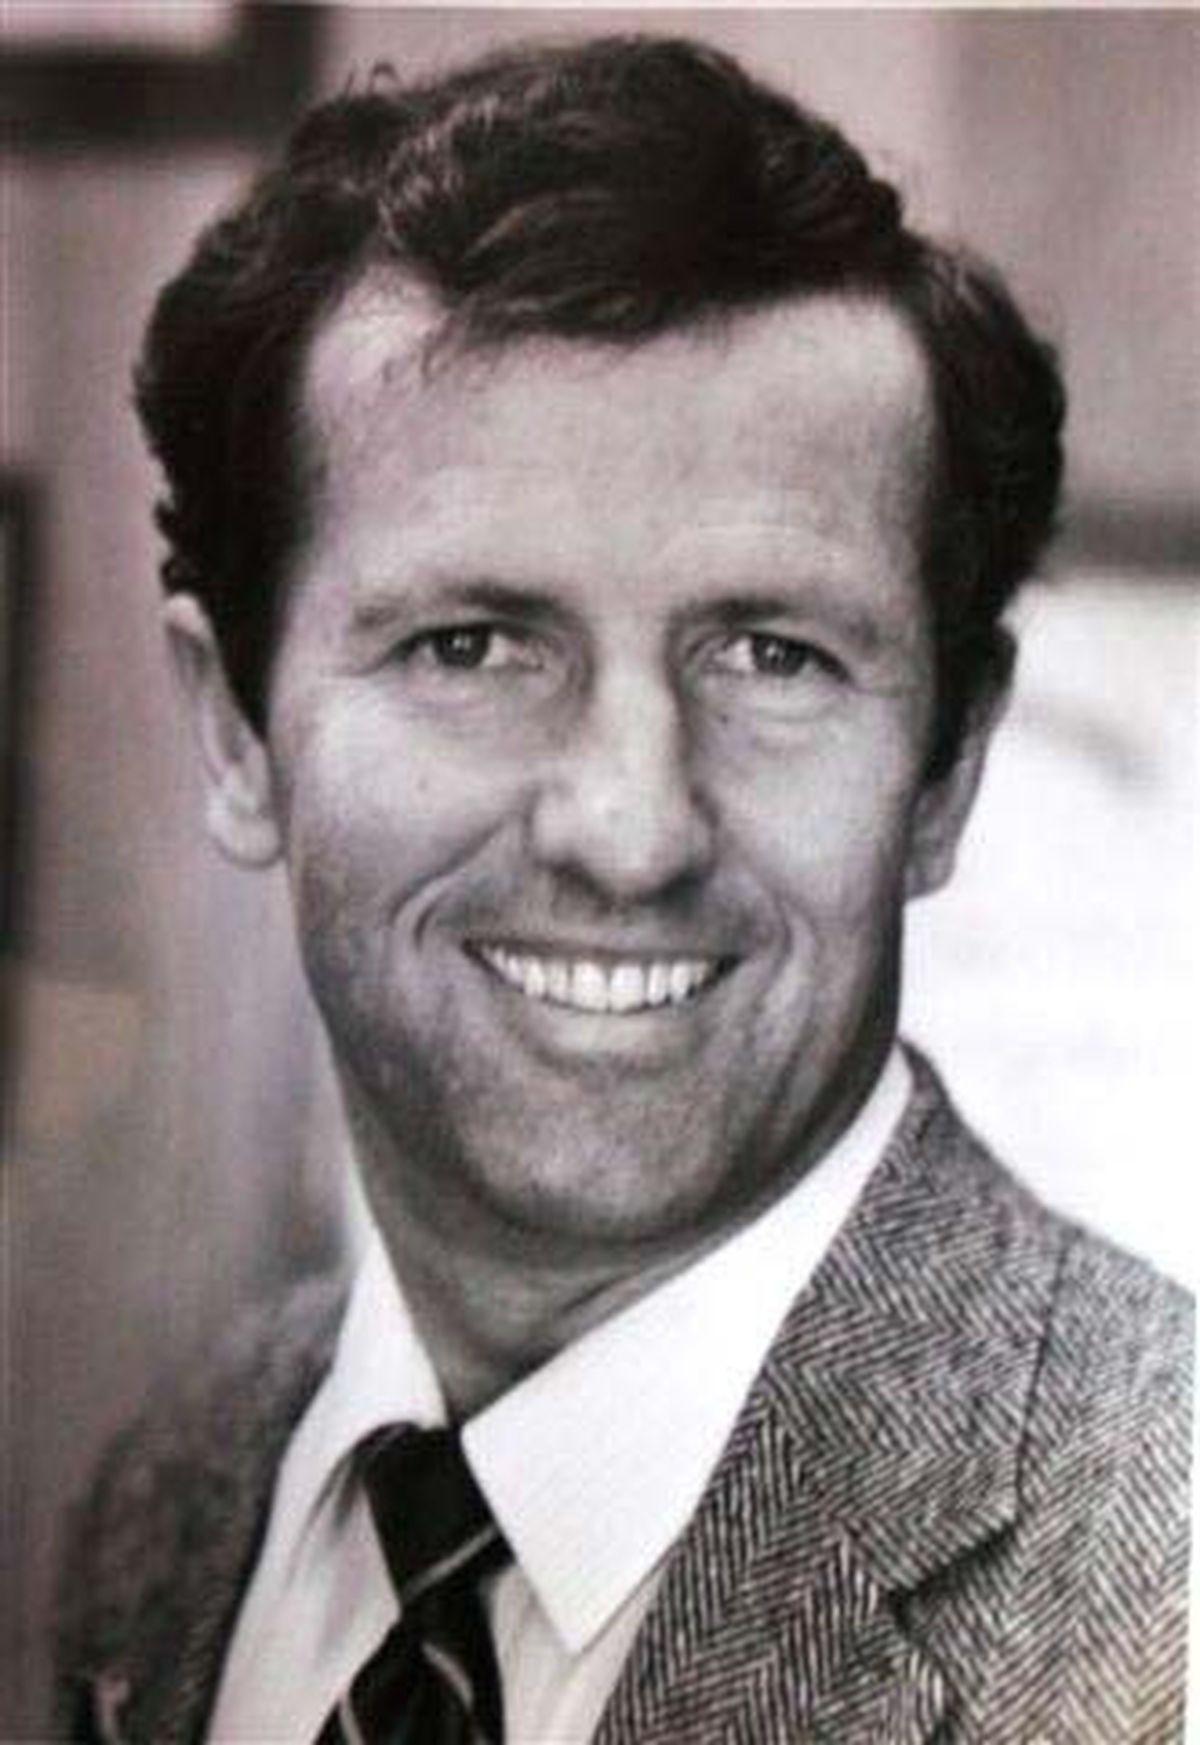 Larry Menard